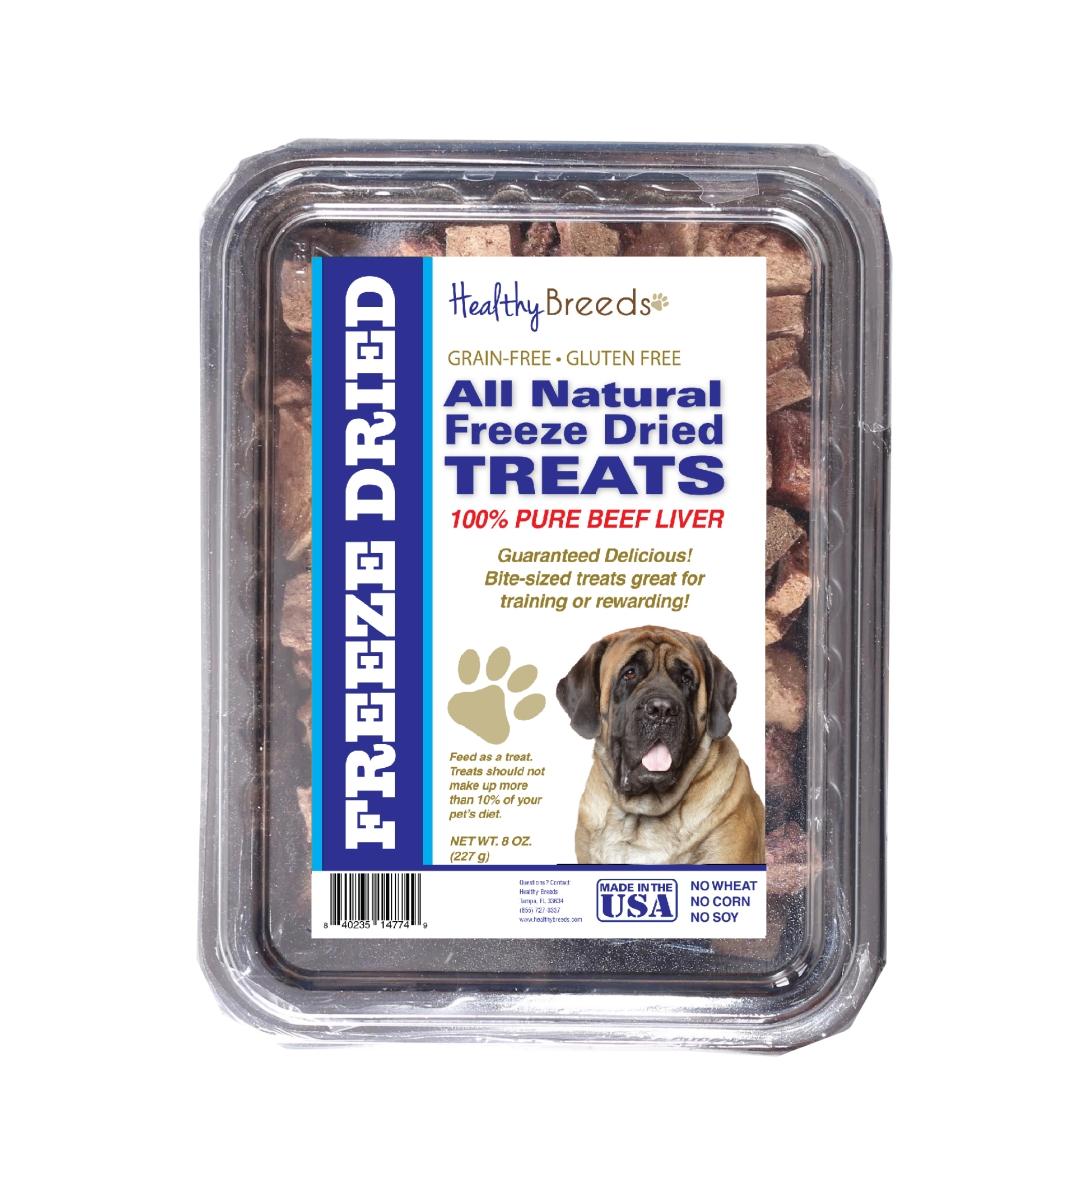 Healthy Breeds 840235147589 10 oz Mastiff All Natural Freeze Dried Treats Beef Liver